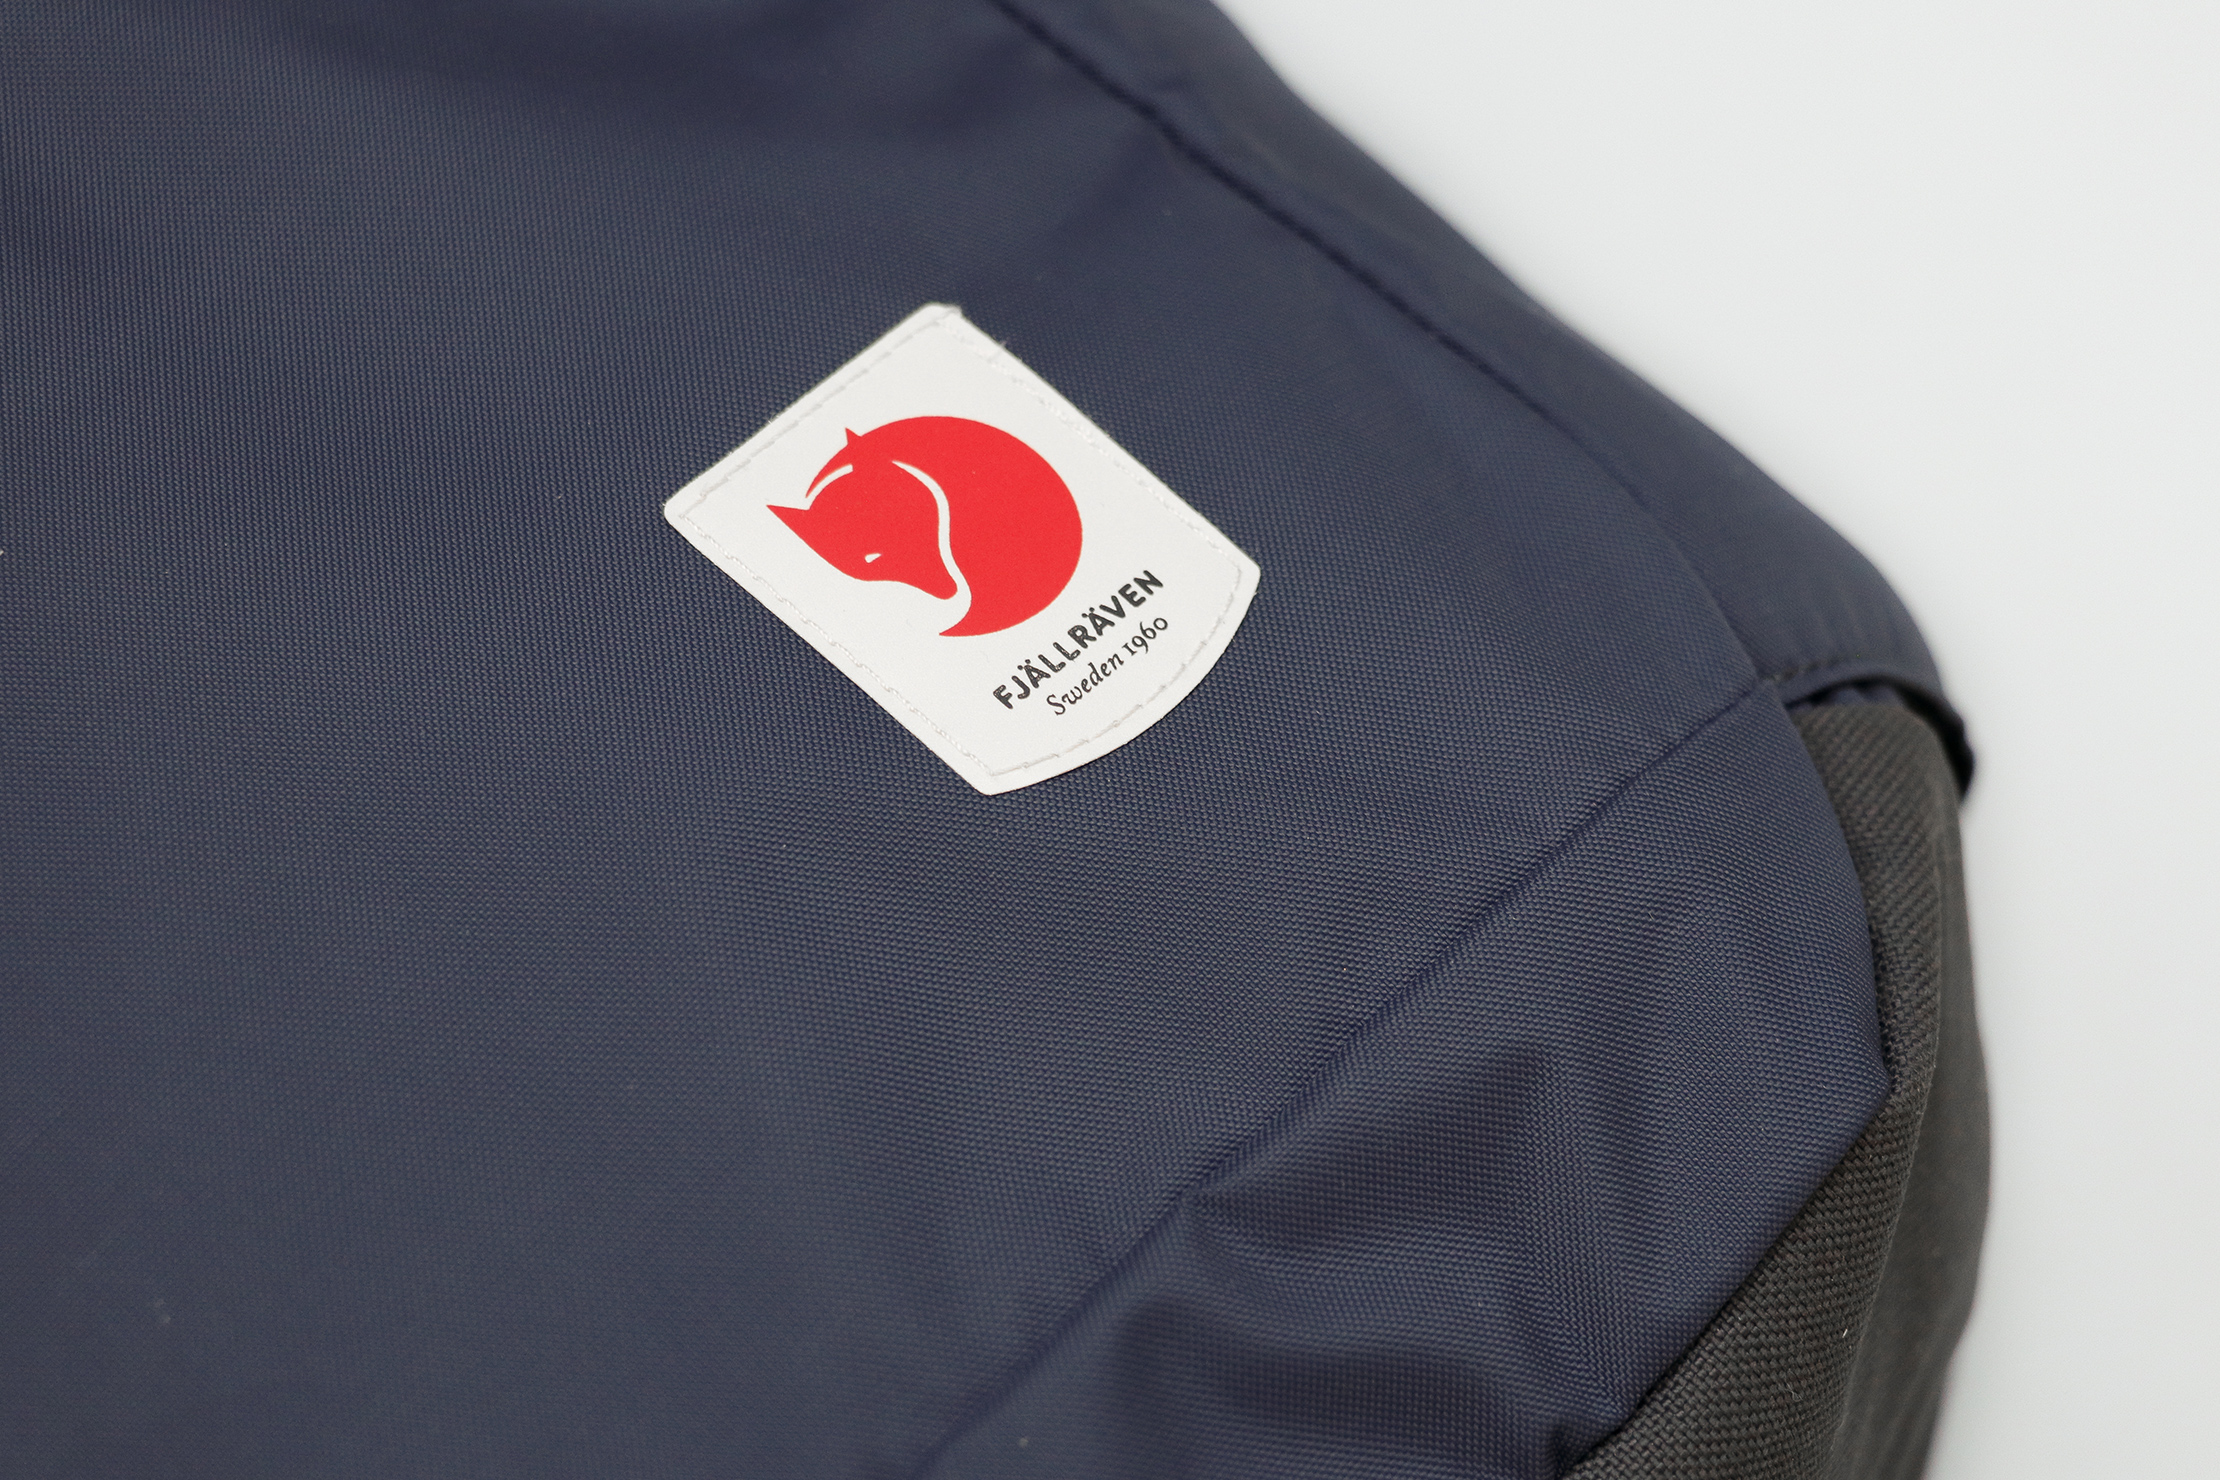 Fjallraven High Coast Foldsack 24 Material and Logo